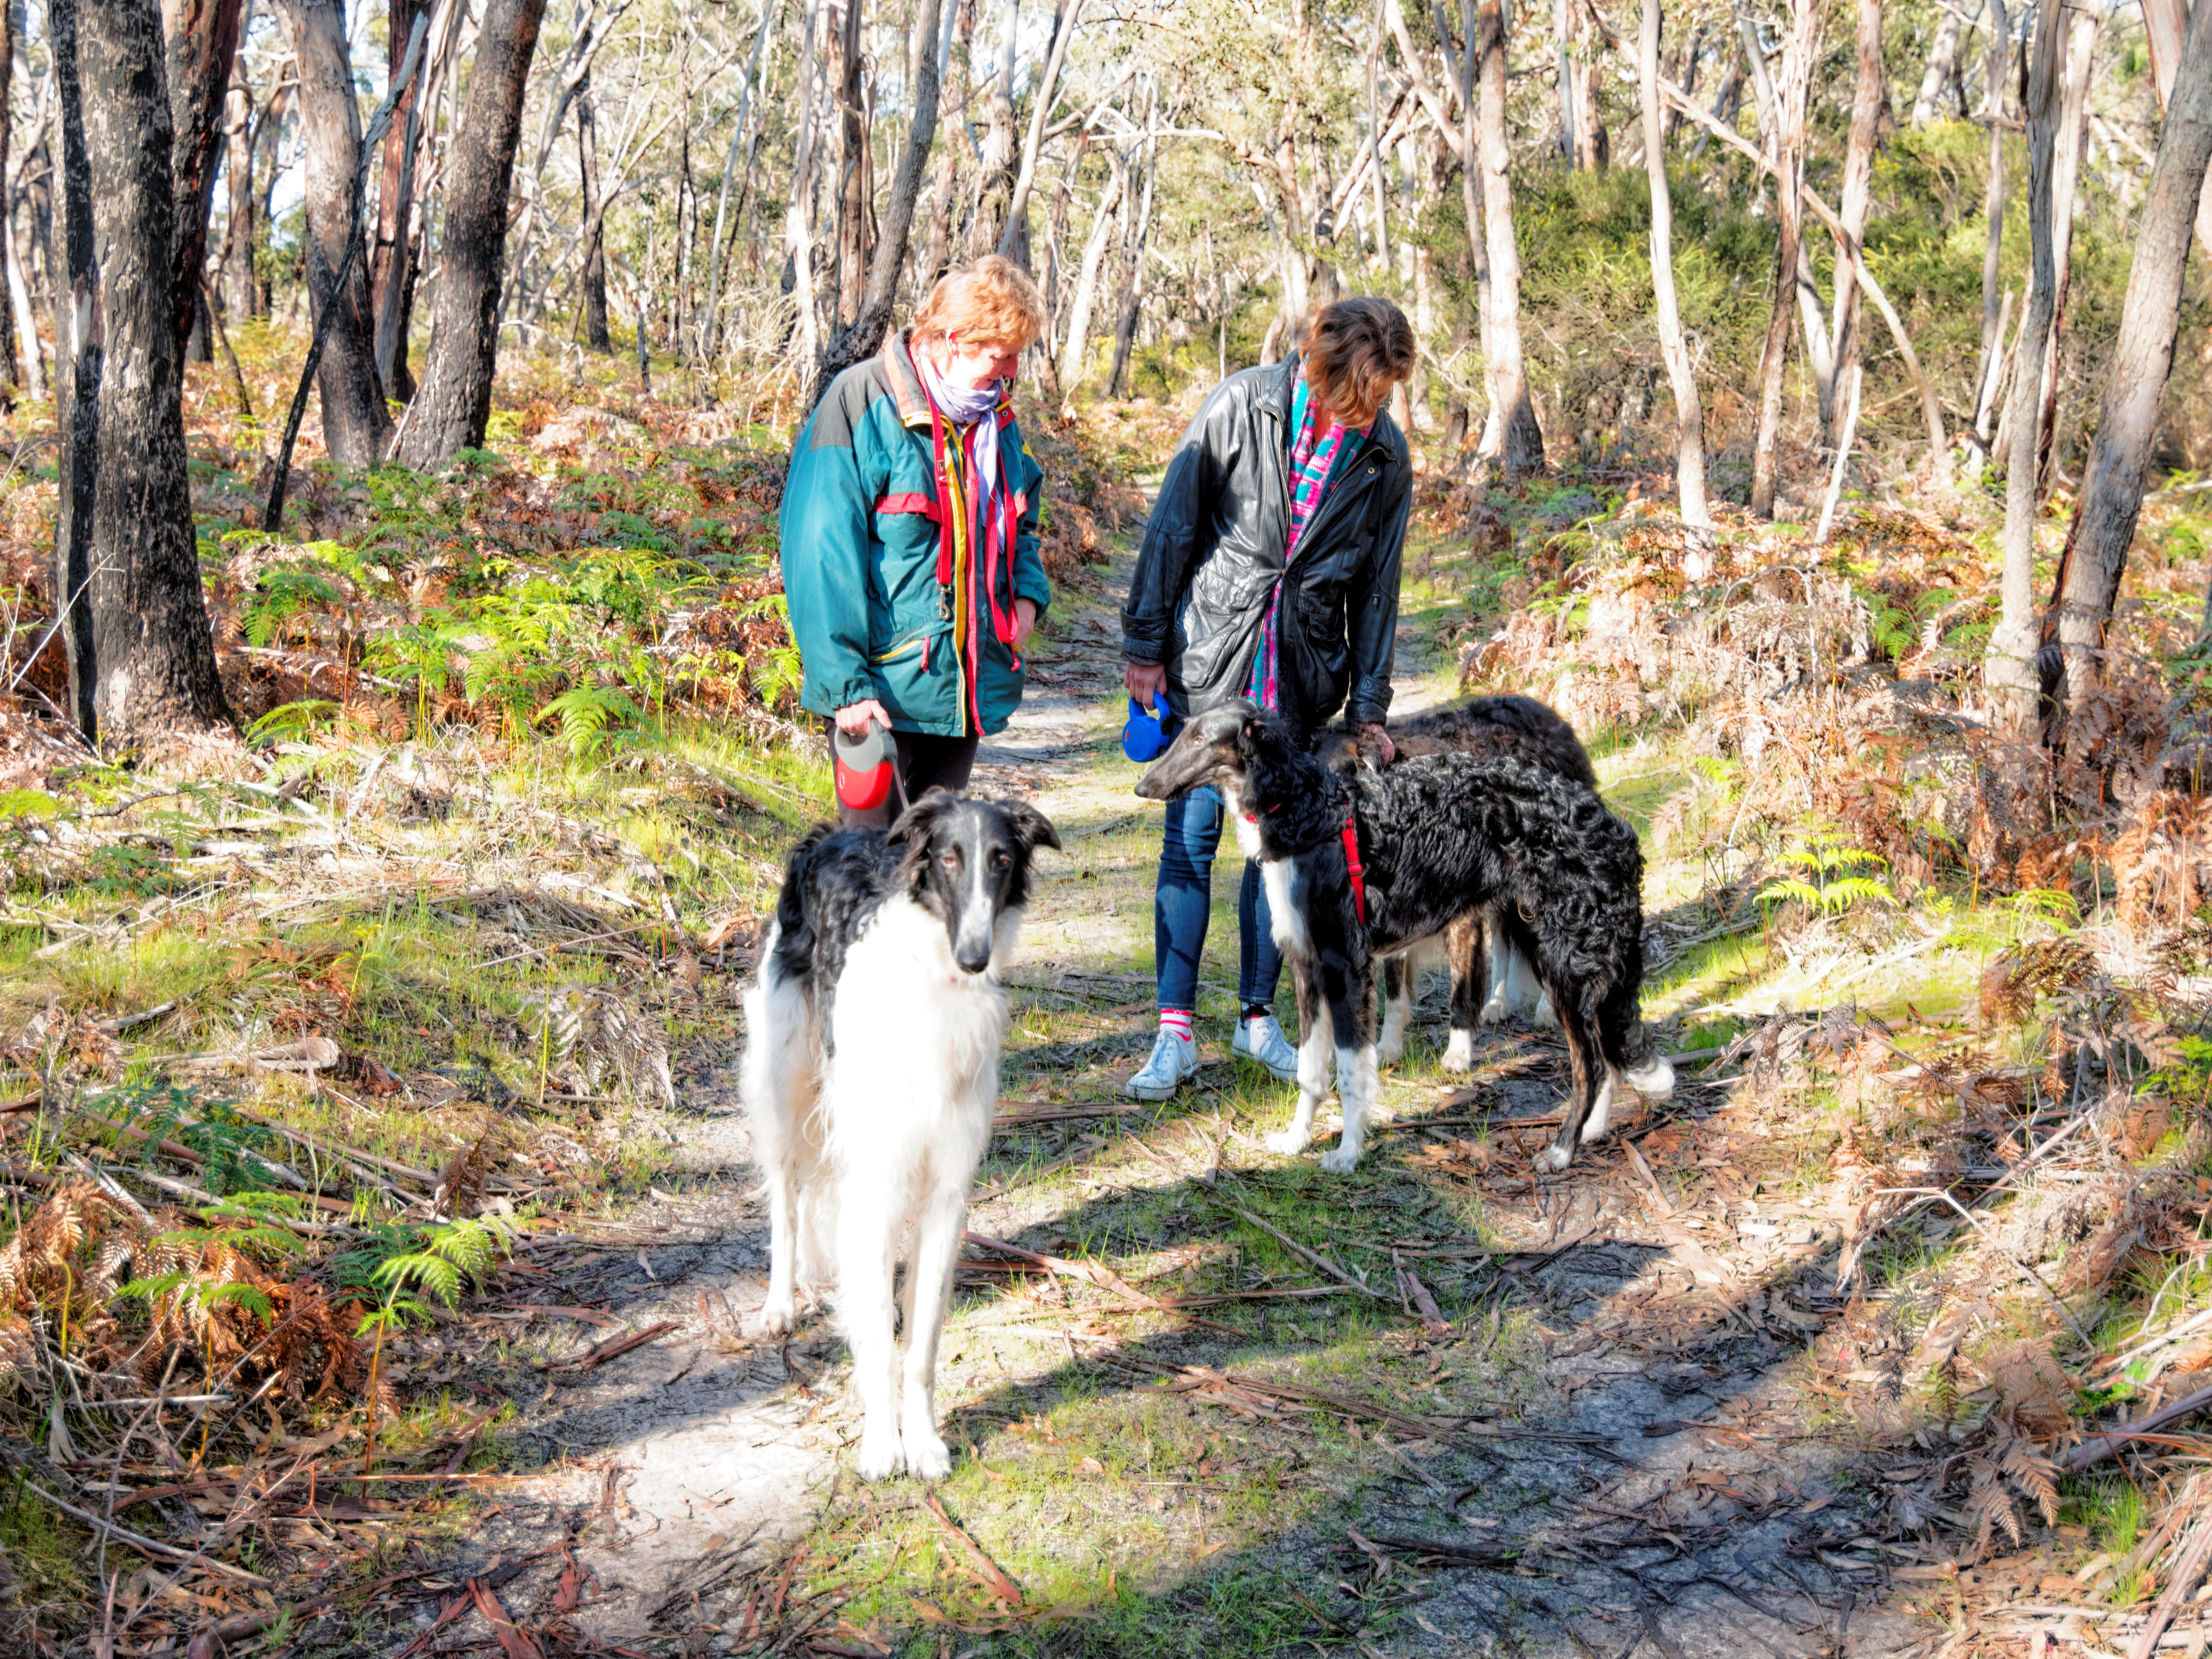 Walk-in-forest-9.jpeg